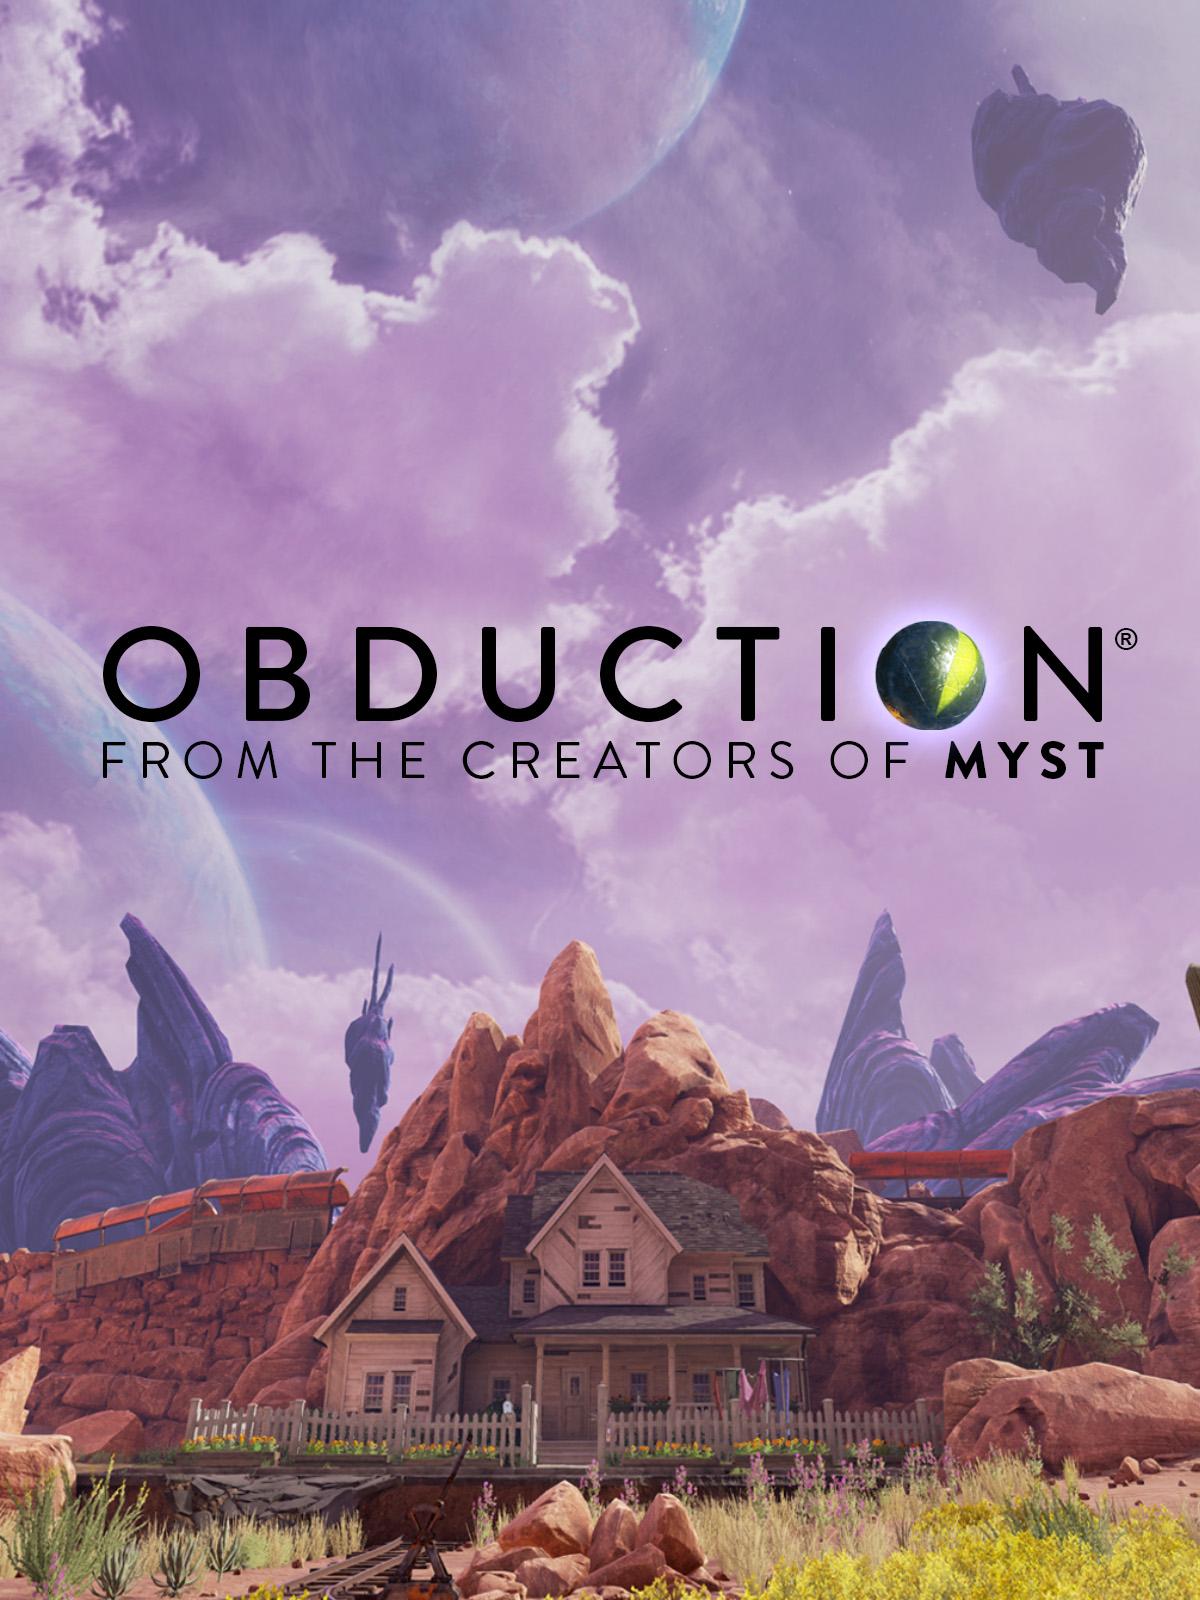 Obduction und Offworld Trading Company kostenlos im Epic Games Store (ab 15.7.)